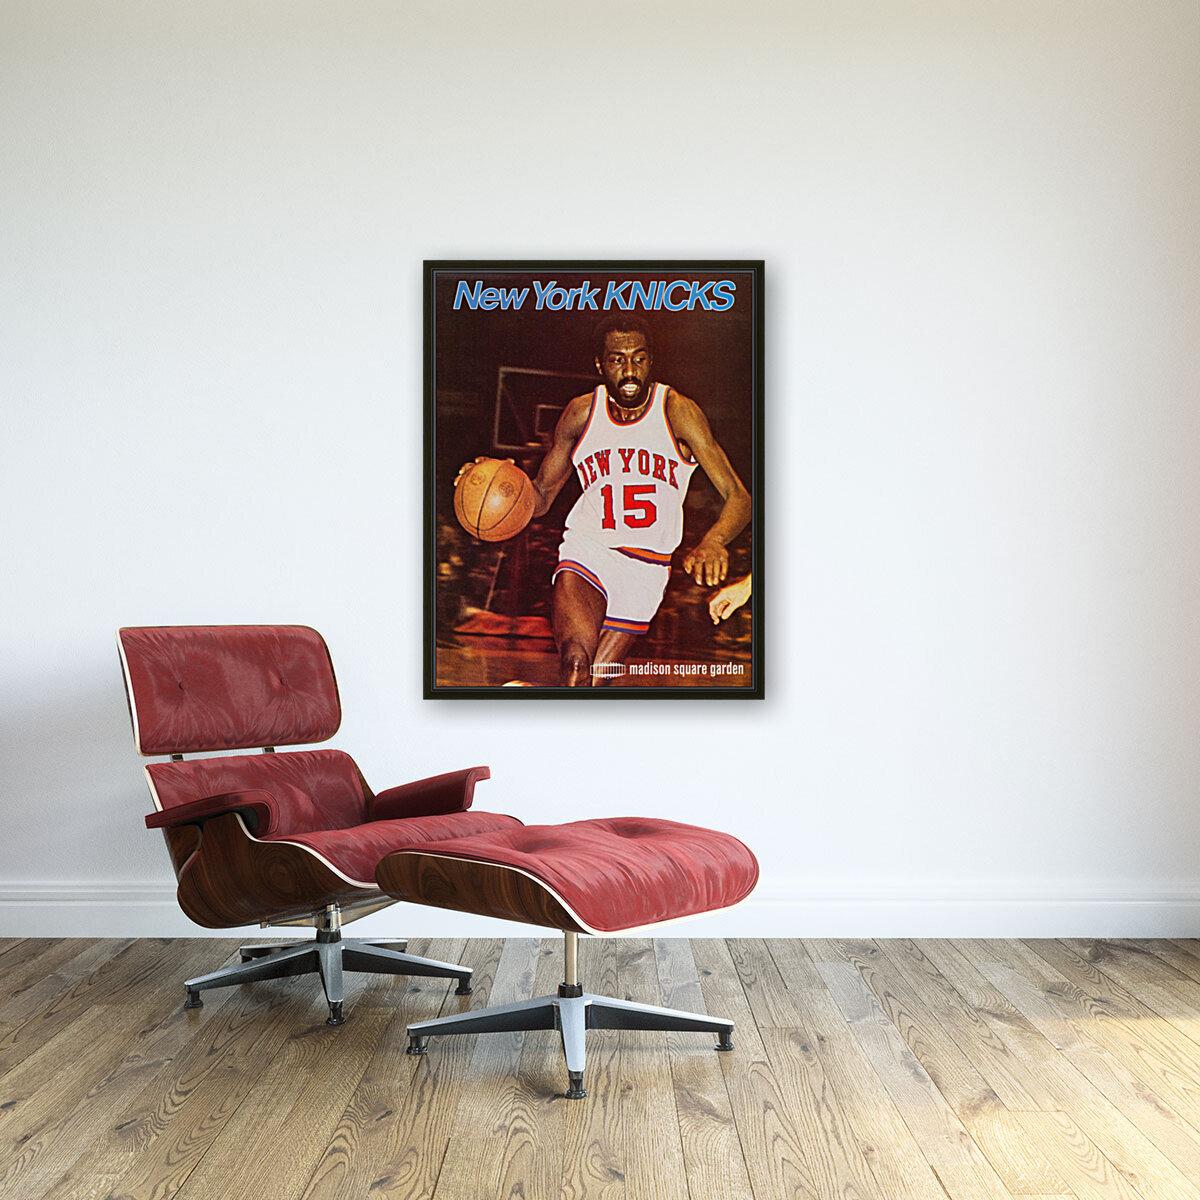 1977 new york knicks basketball poster  Art